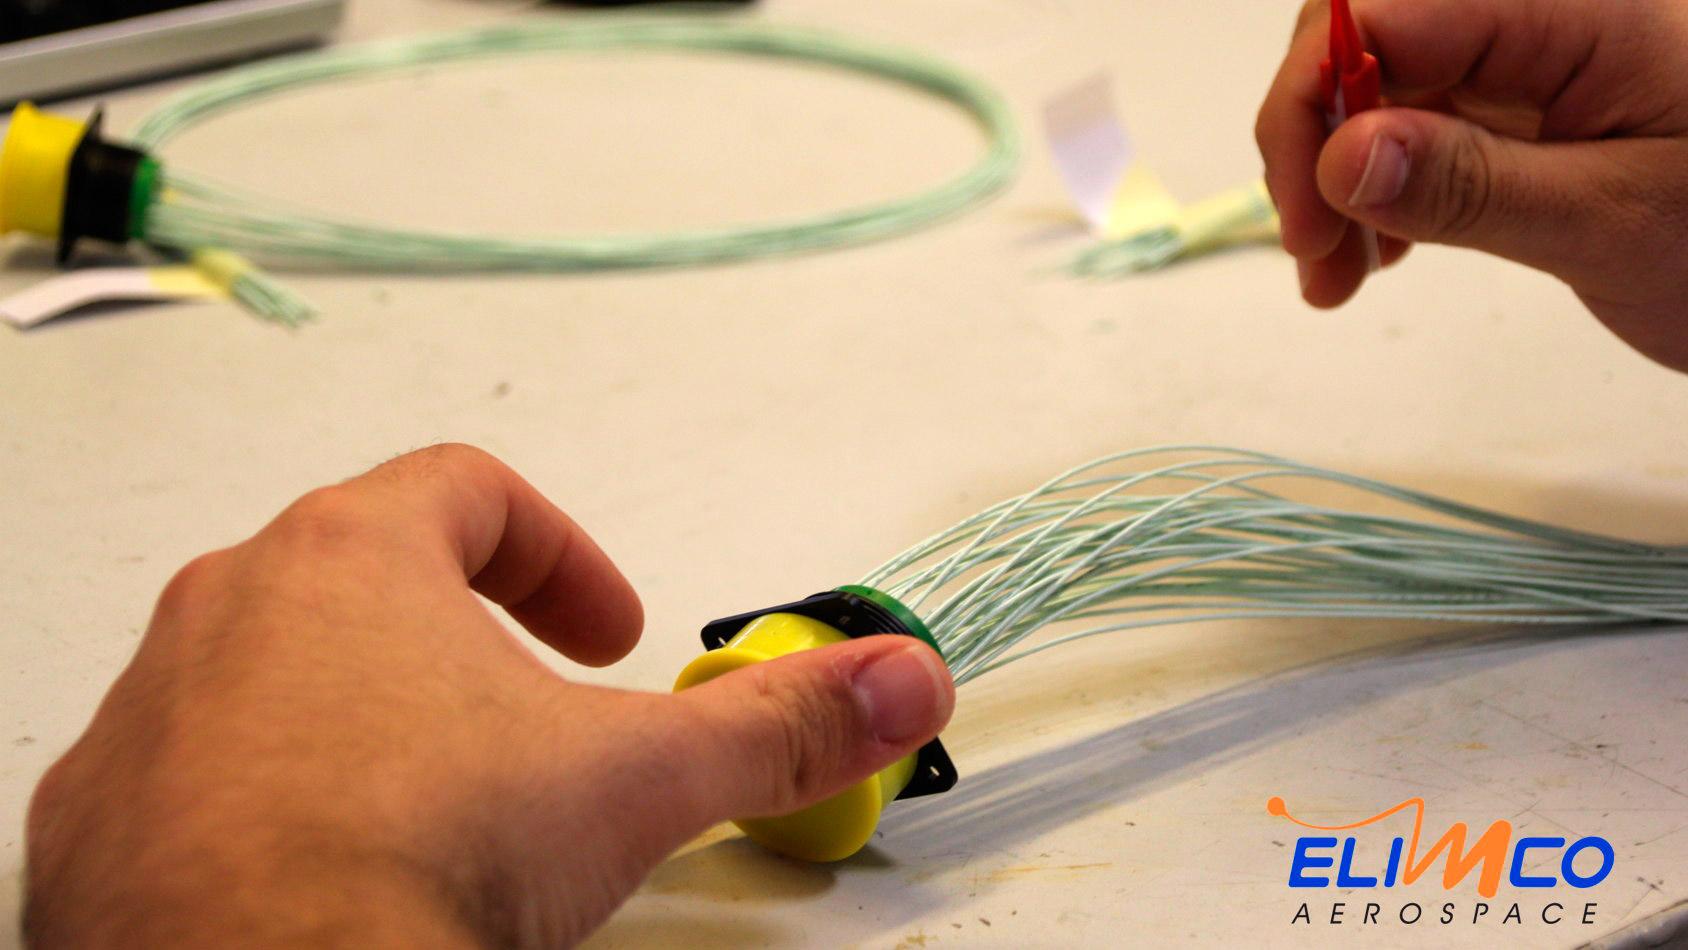 Manufacture - Elimco Aerospace